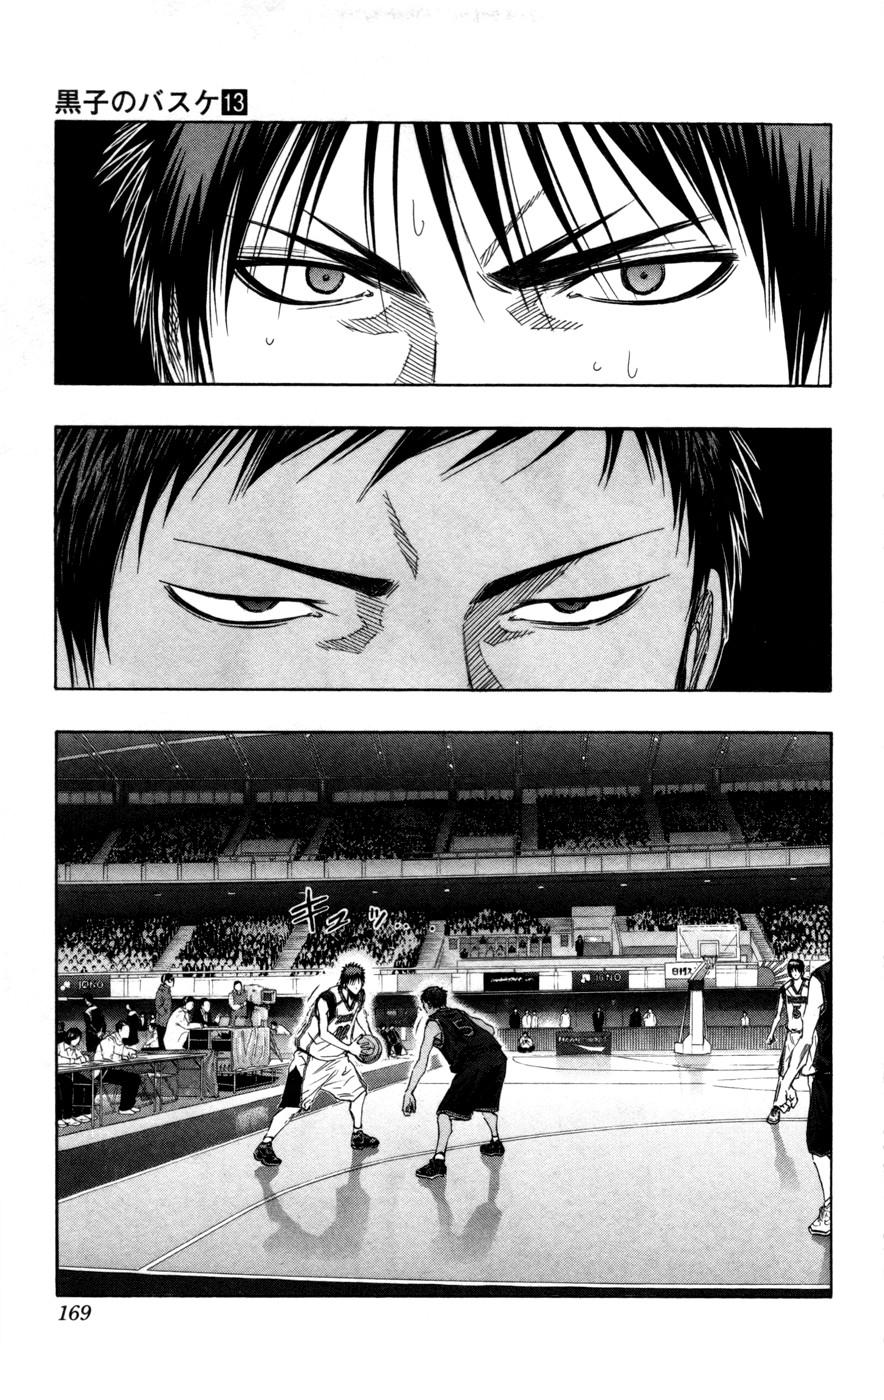 Kuroko no Basket Manga Chapter 117 - Image 3_169